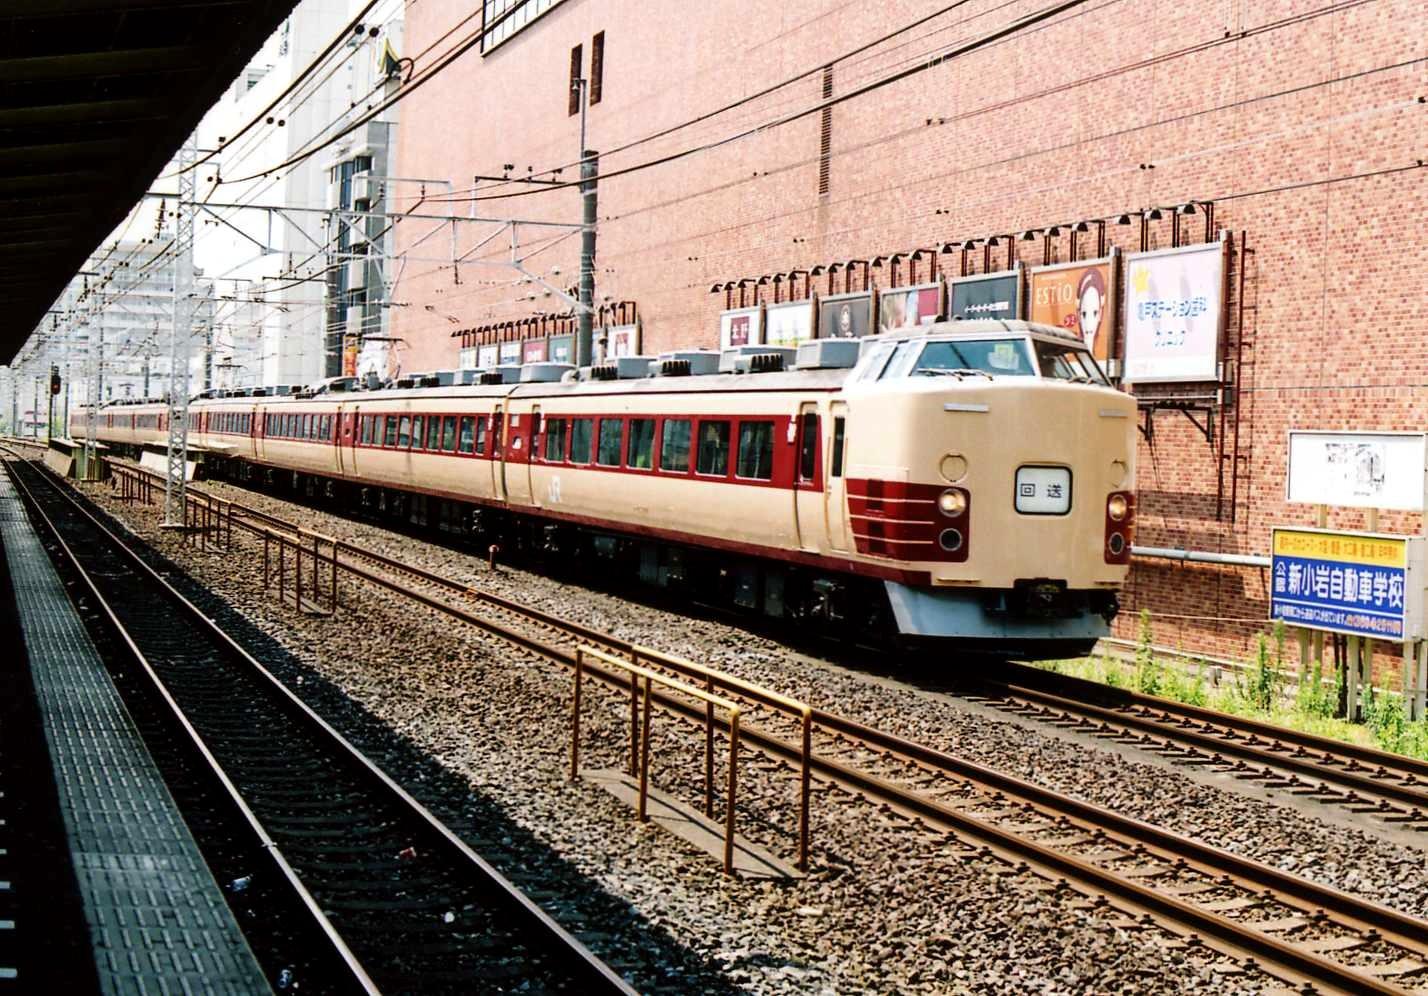 http://livedoor.blogimg.jp/h_nekomata/imgs/3/4/34c92ffe.jpg